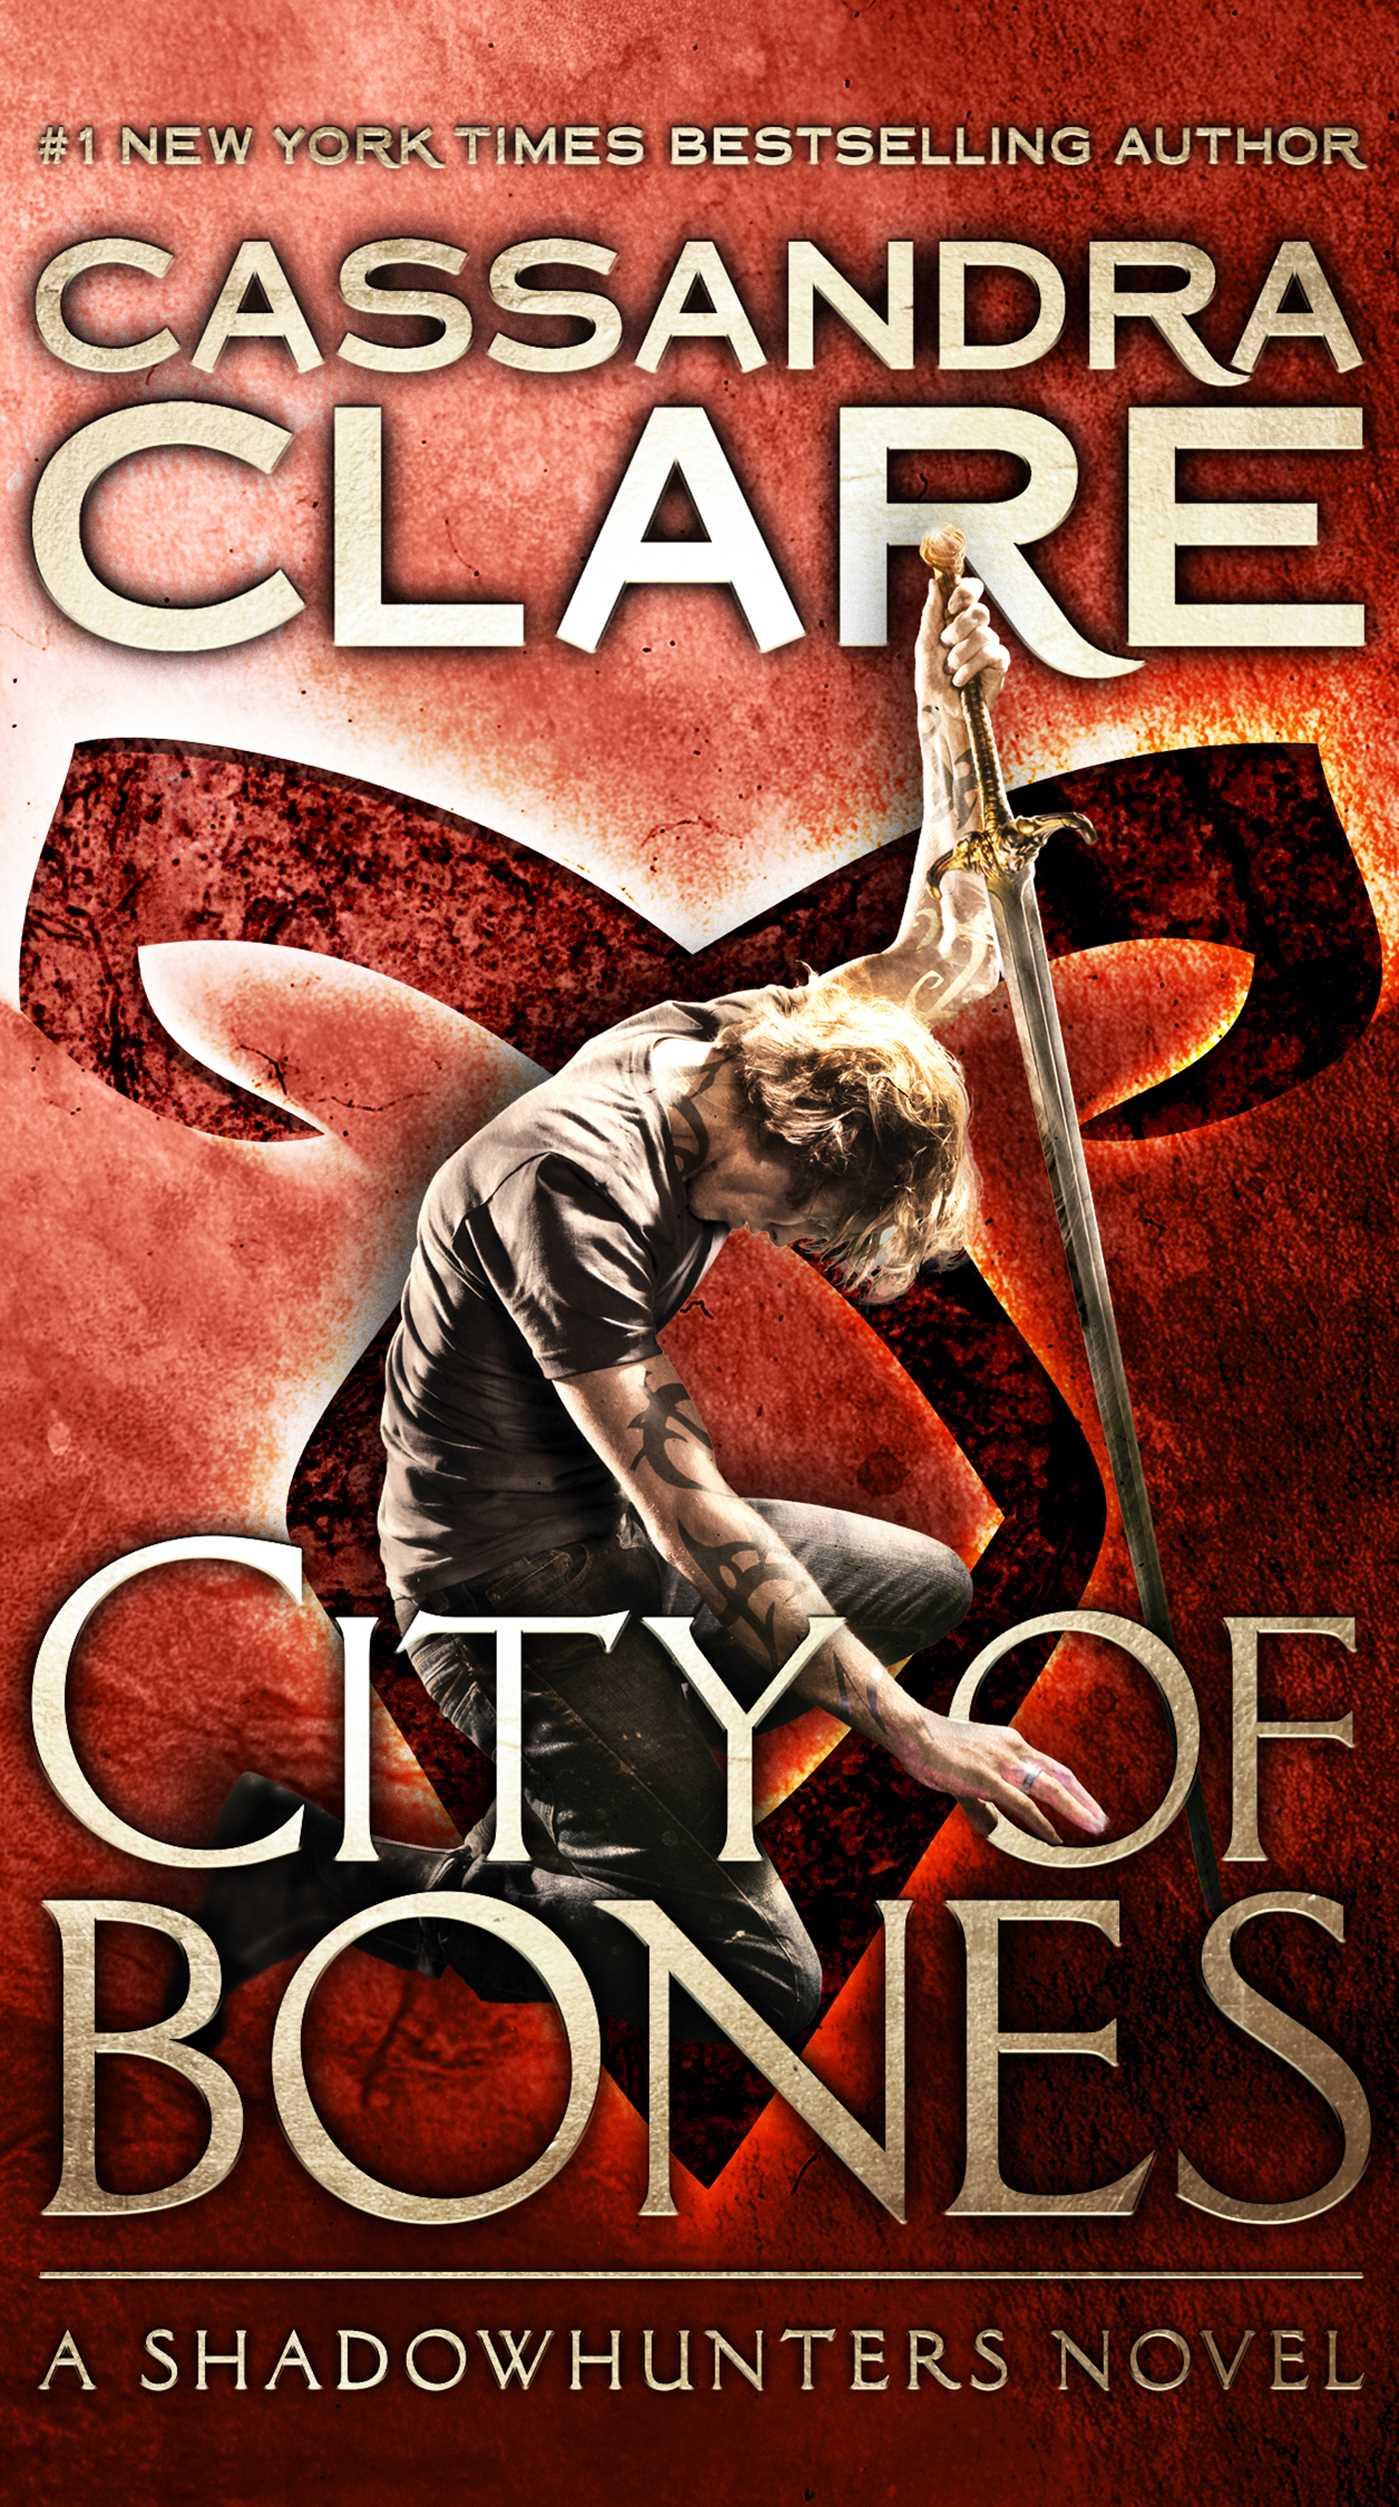 City of bones 9781534431782 hr